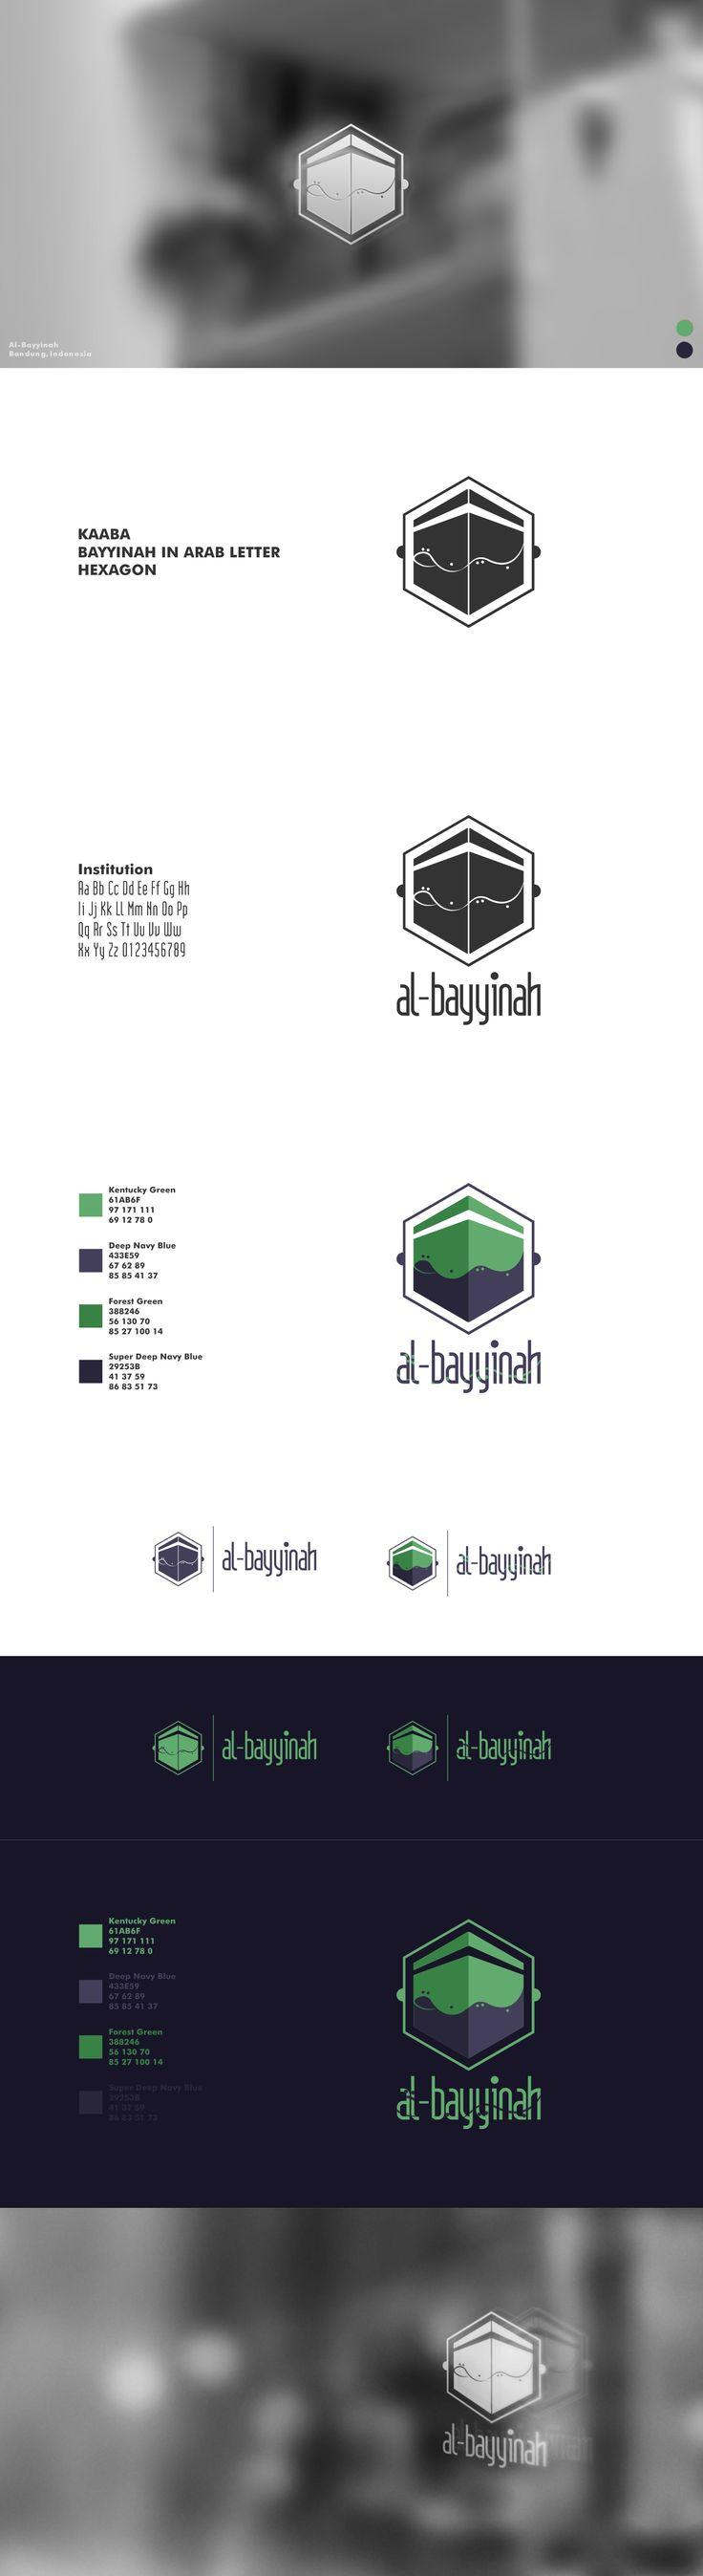 Al-Bayyinah - Visual Identity #visual #identity #visualidentity #logo #graphic #design #graphicdesign #digitalart #presentation #portfolio